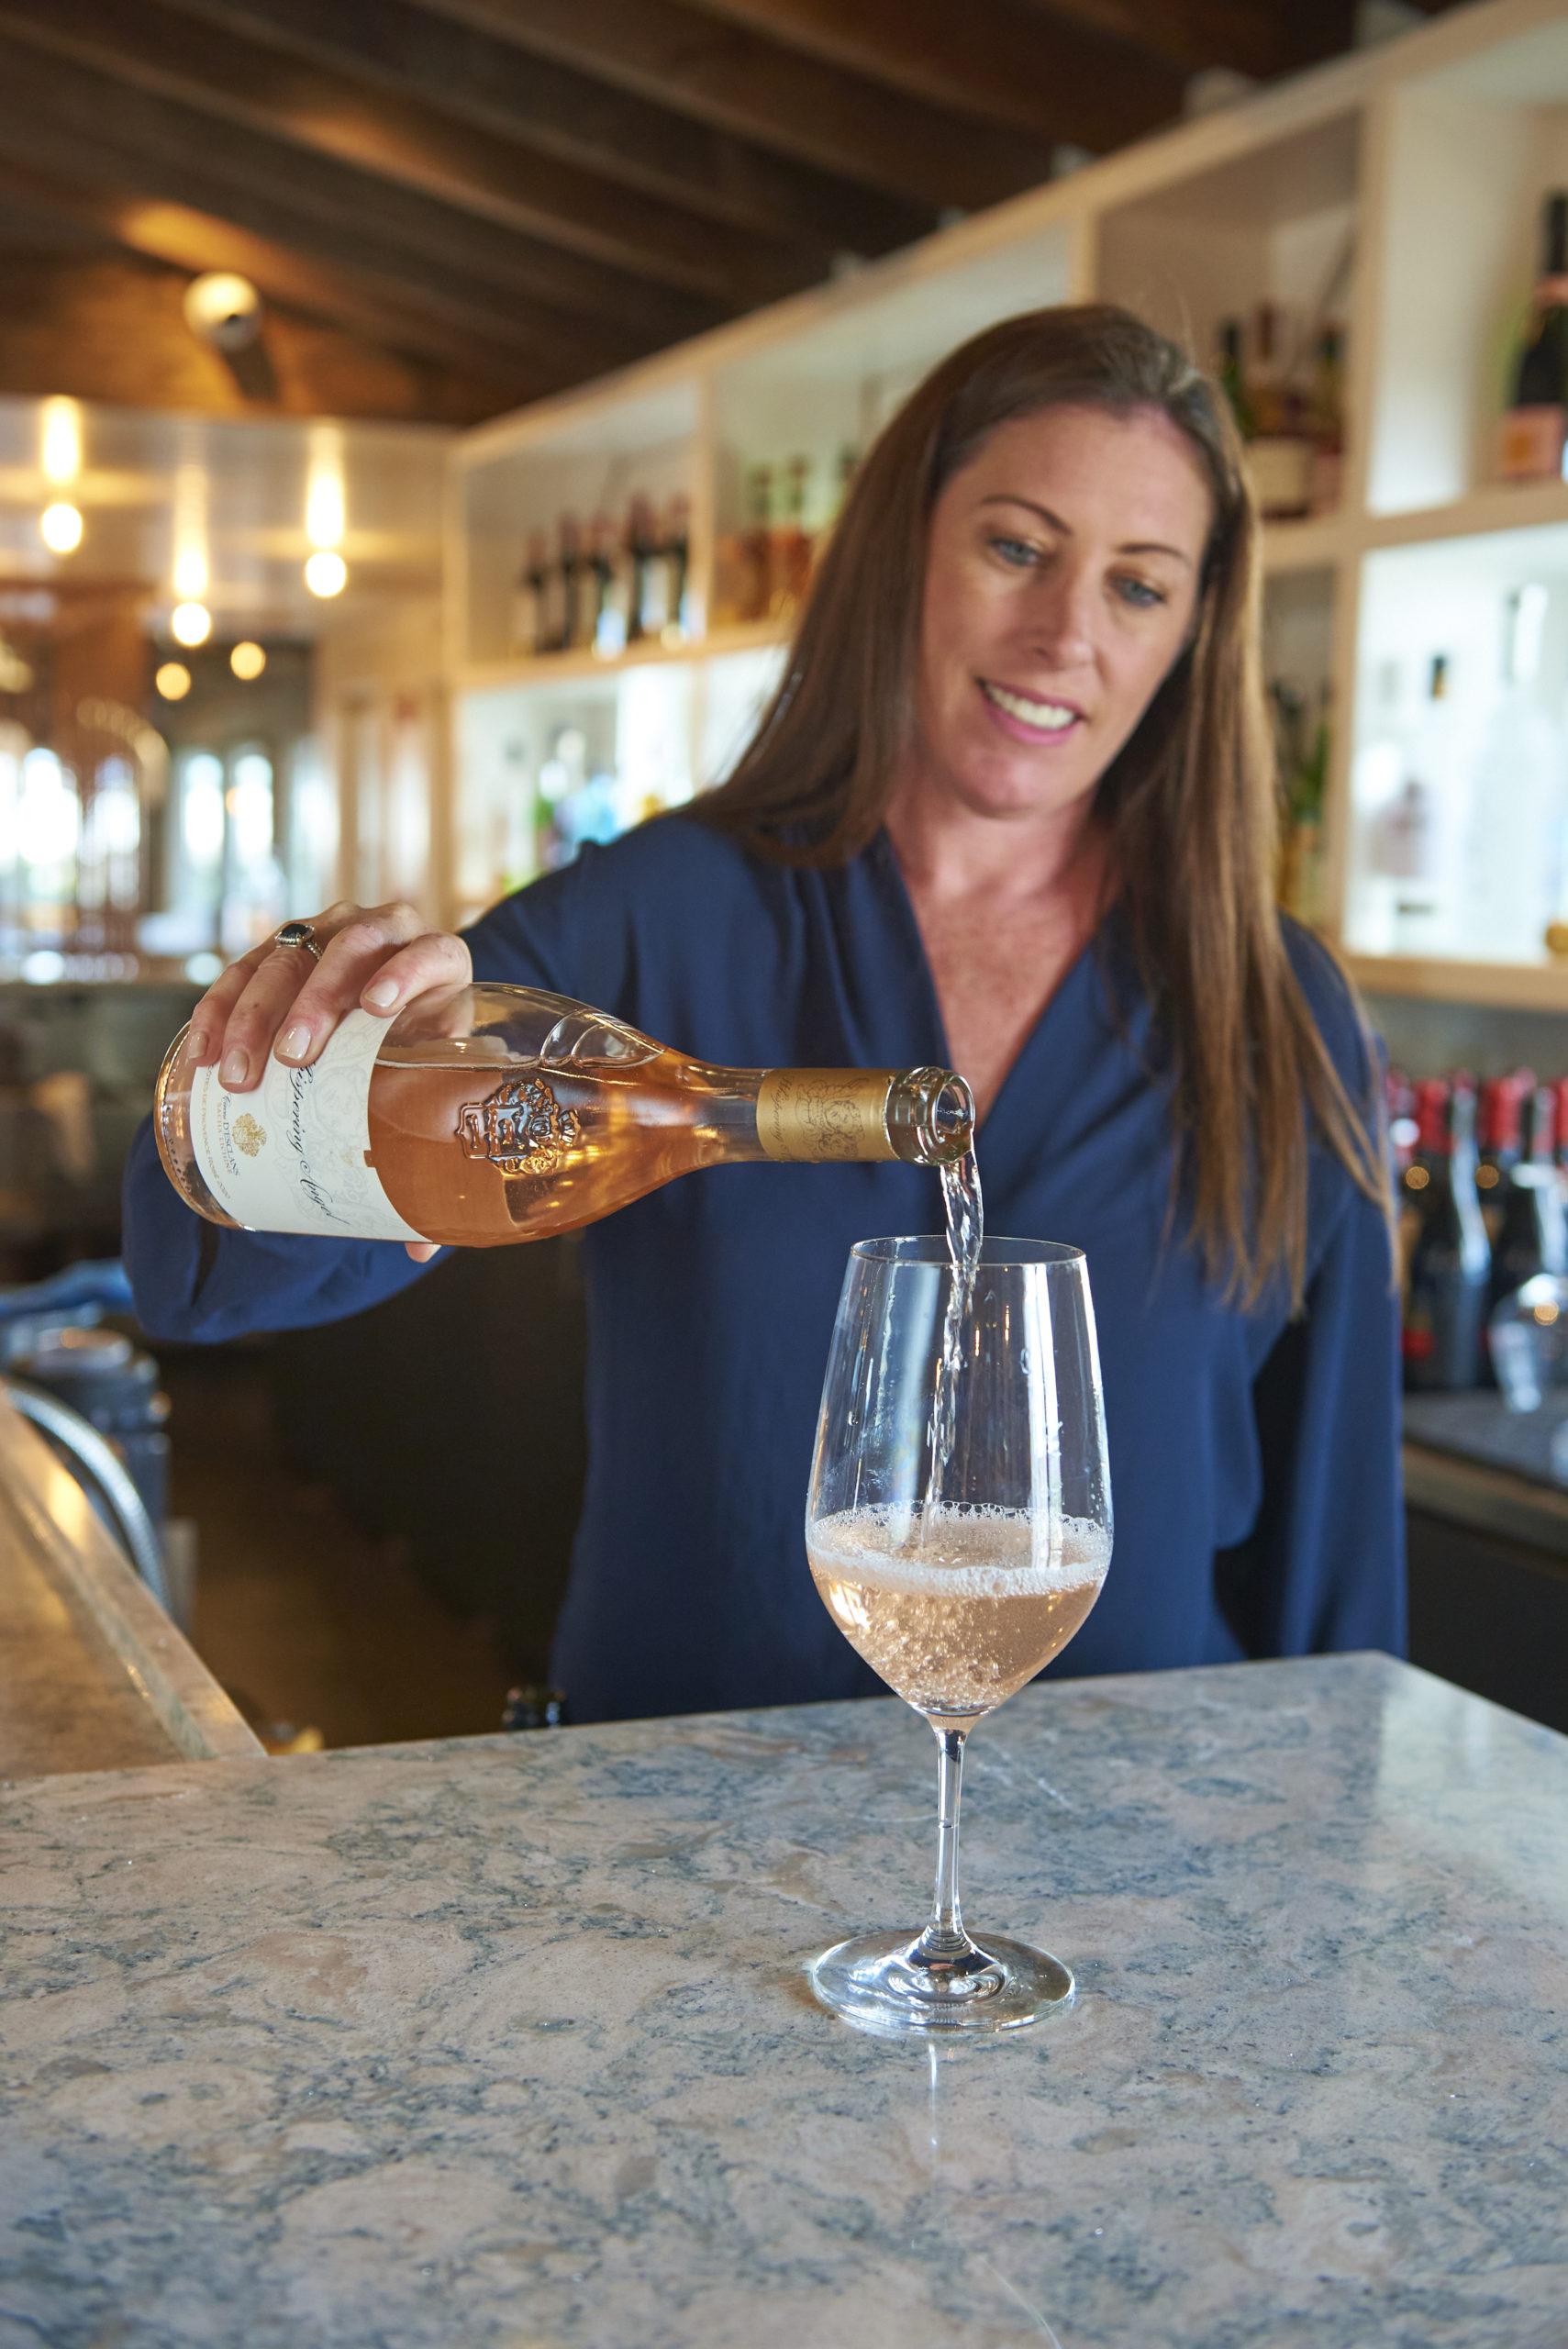 La Fin Kitchen & Lounge's beverage manager Erin Swain.